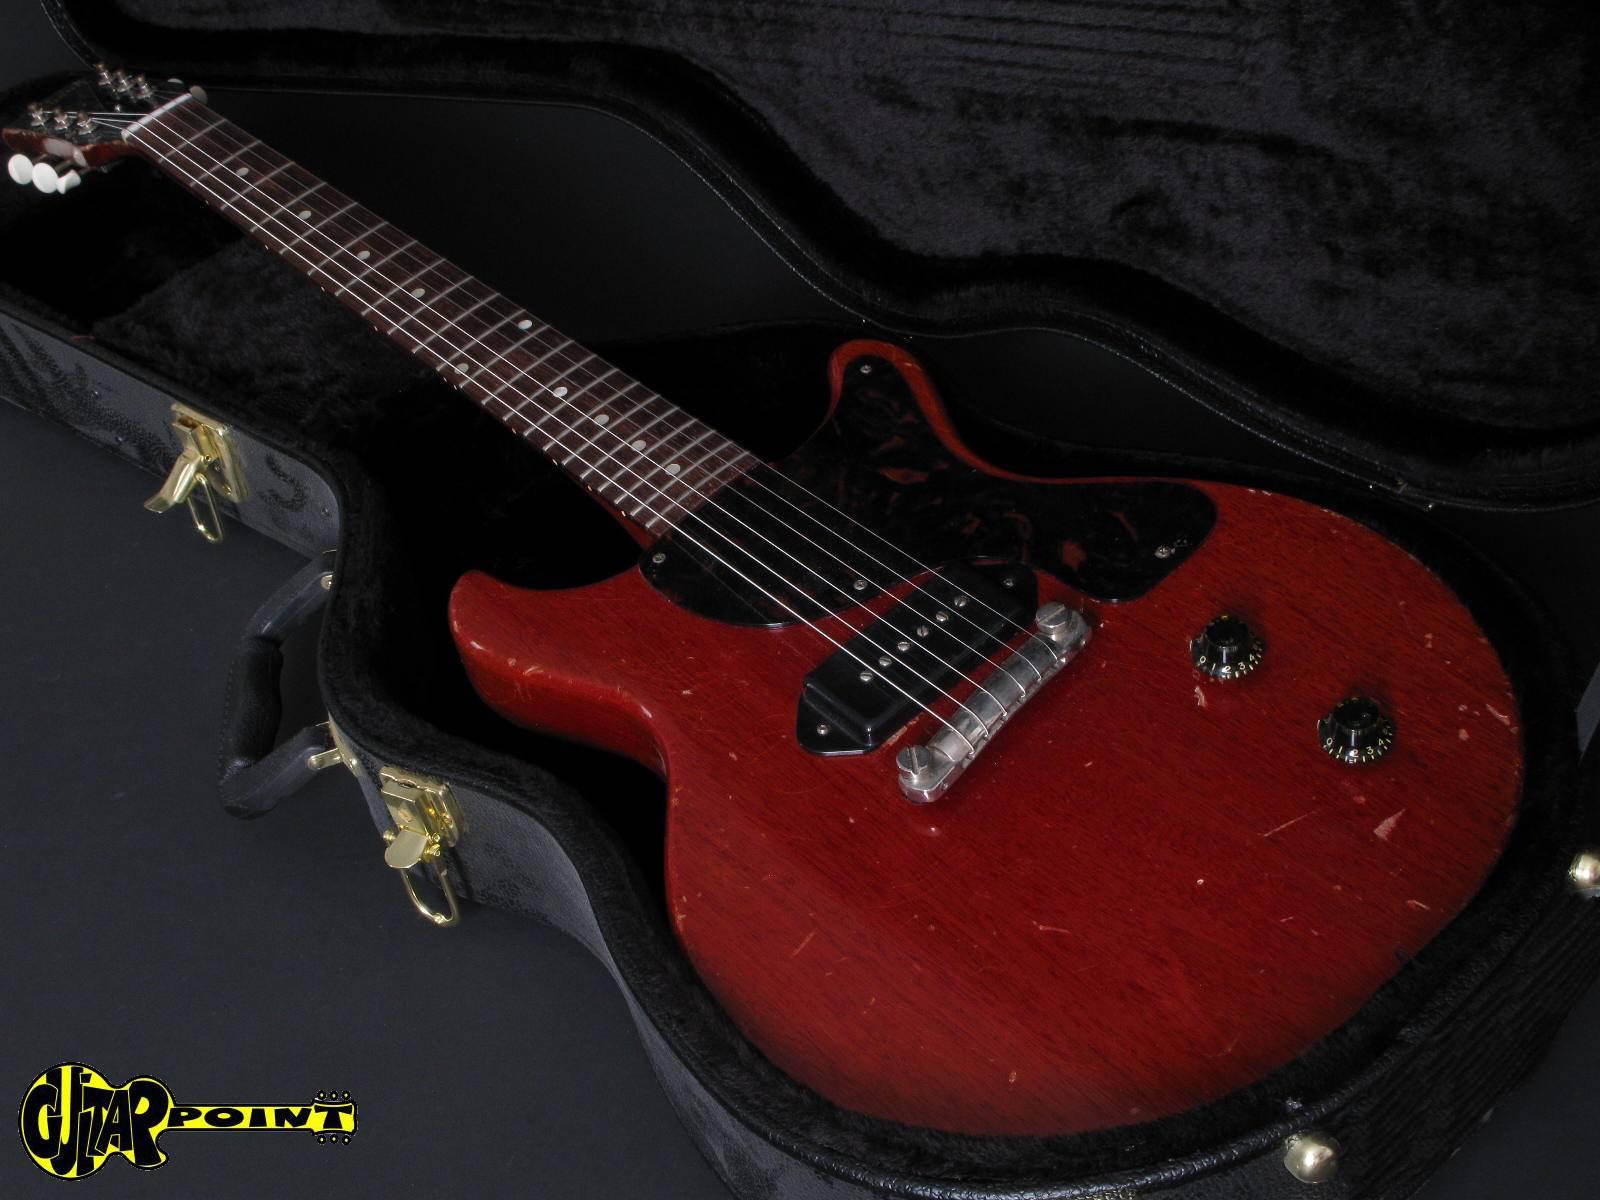 gibson les paul junior 1959 cherry guitar for sale guitarpoint. Black Bedroom Furniture Sets. Home Design Ideas